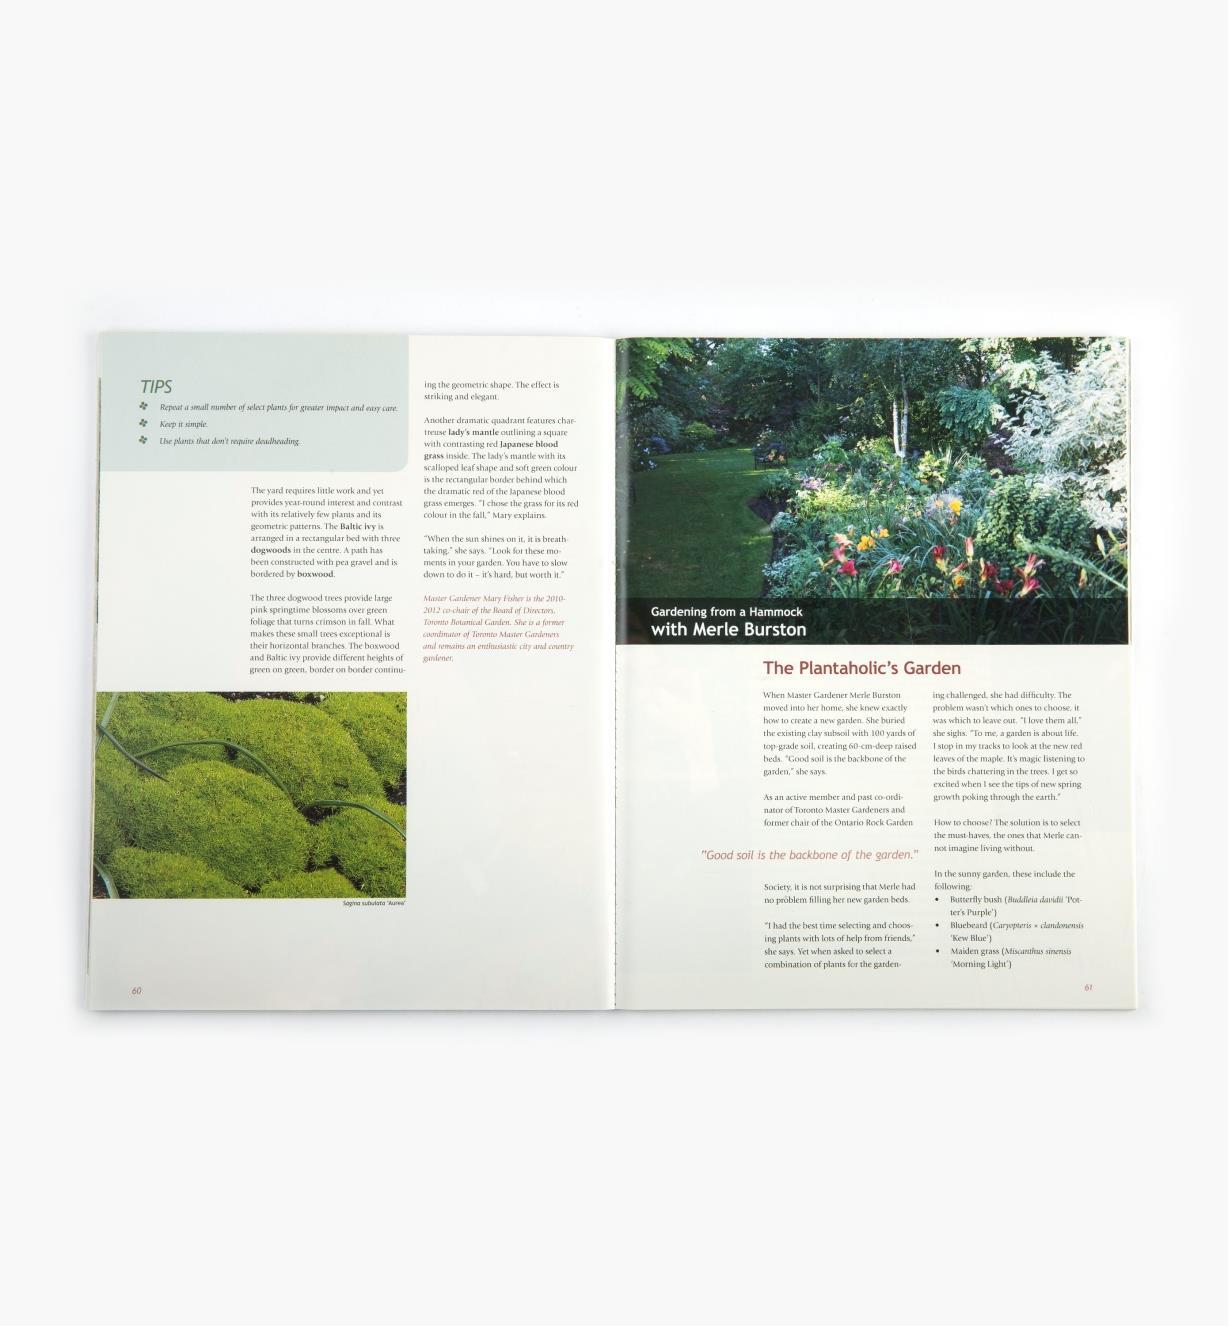 LA542 - Gardening from a Hammock